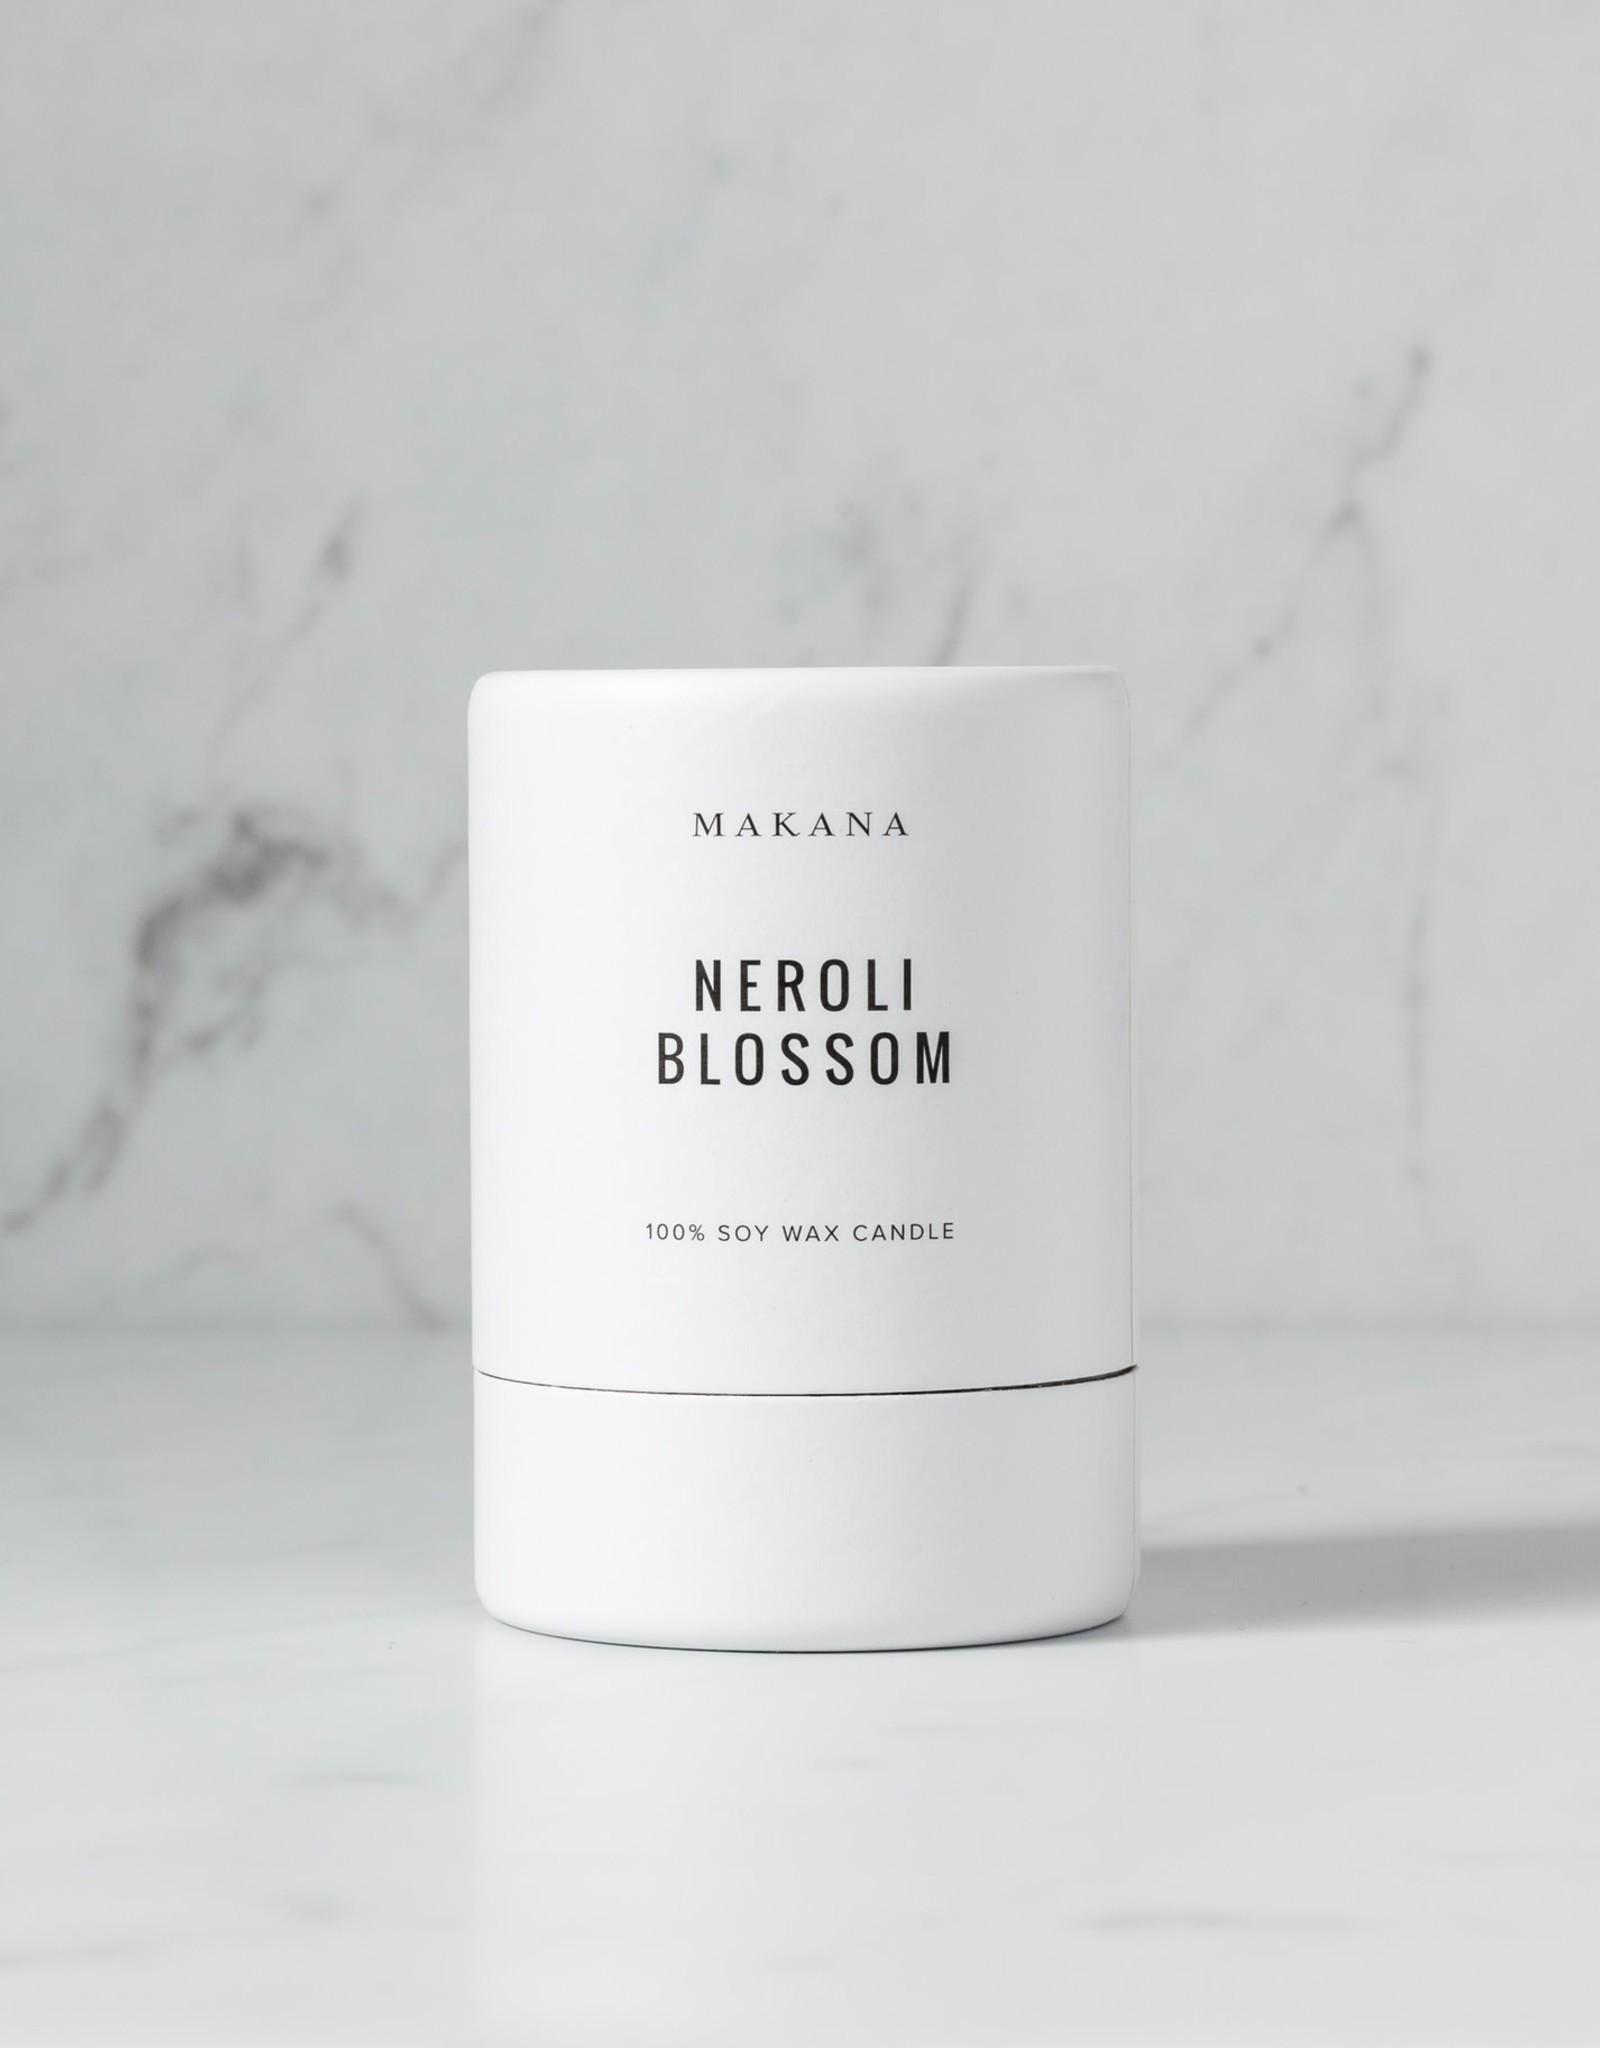 makana Neroli Blossom - Petite Candle Three